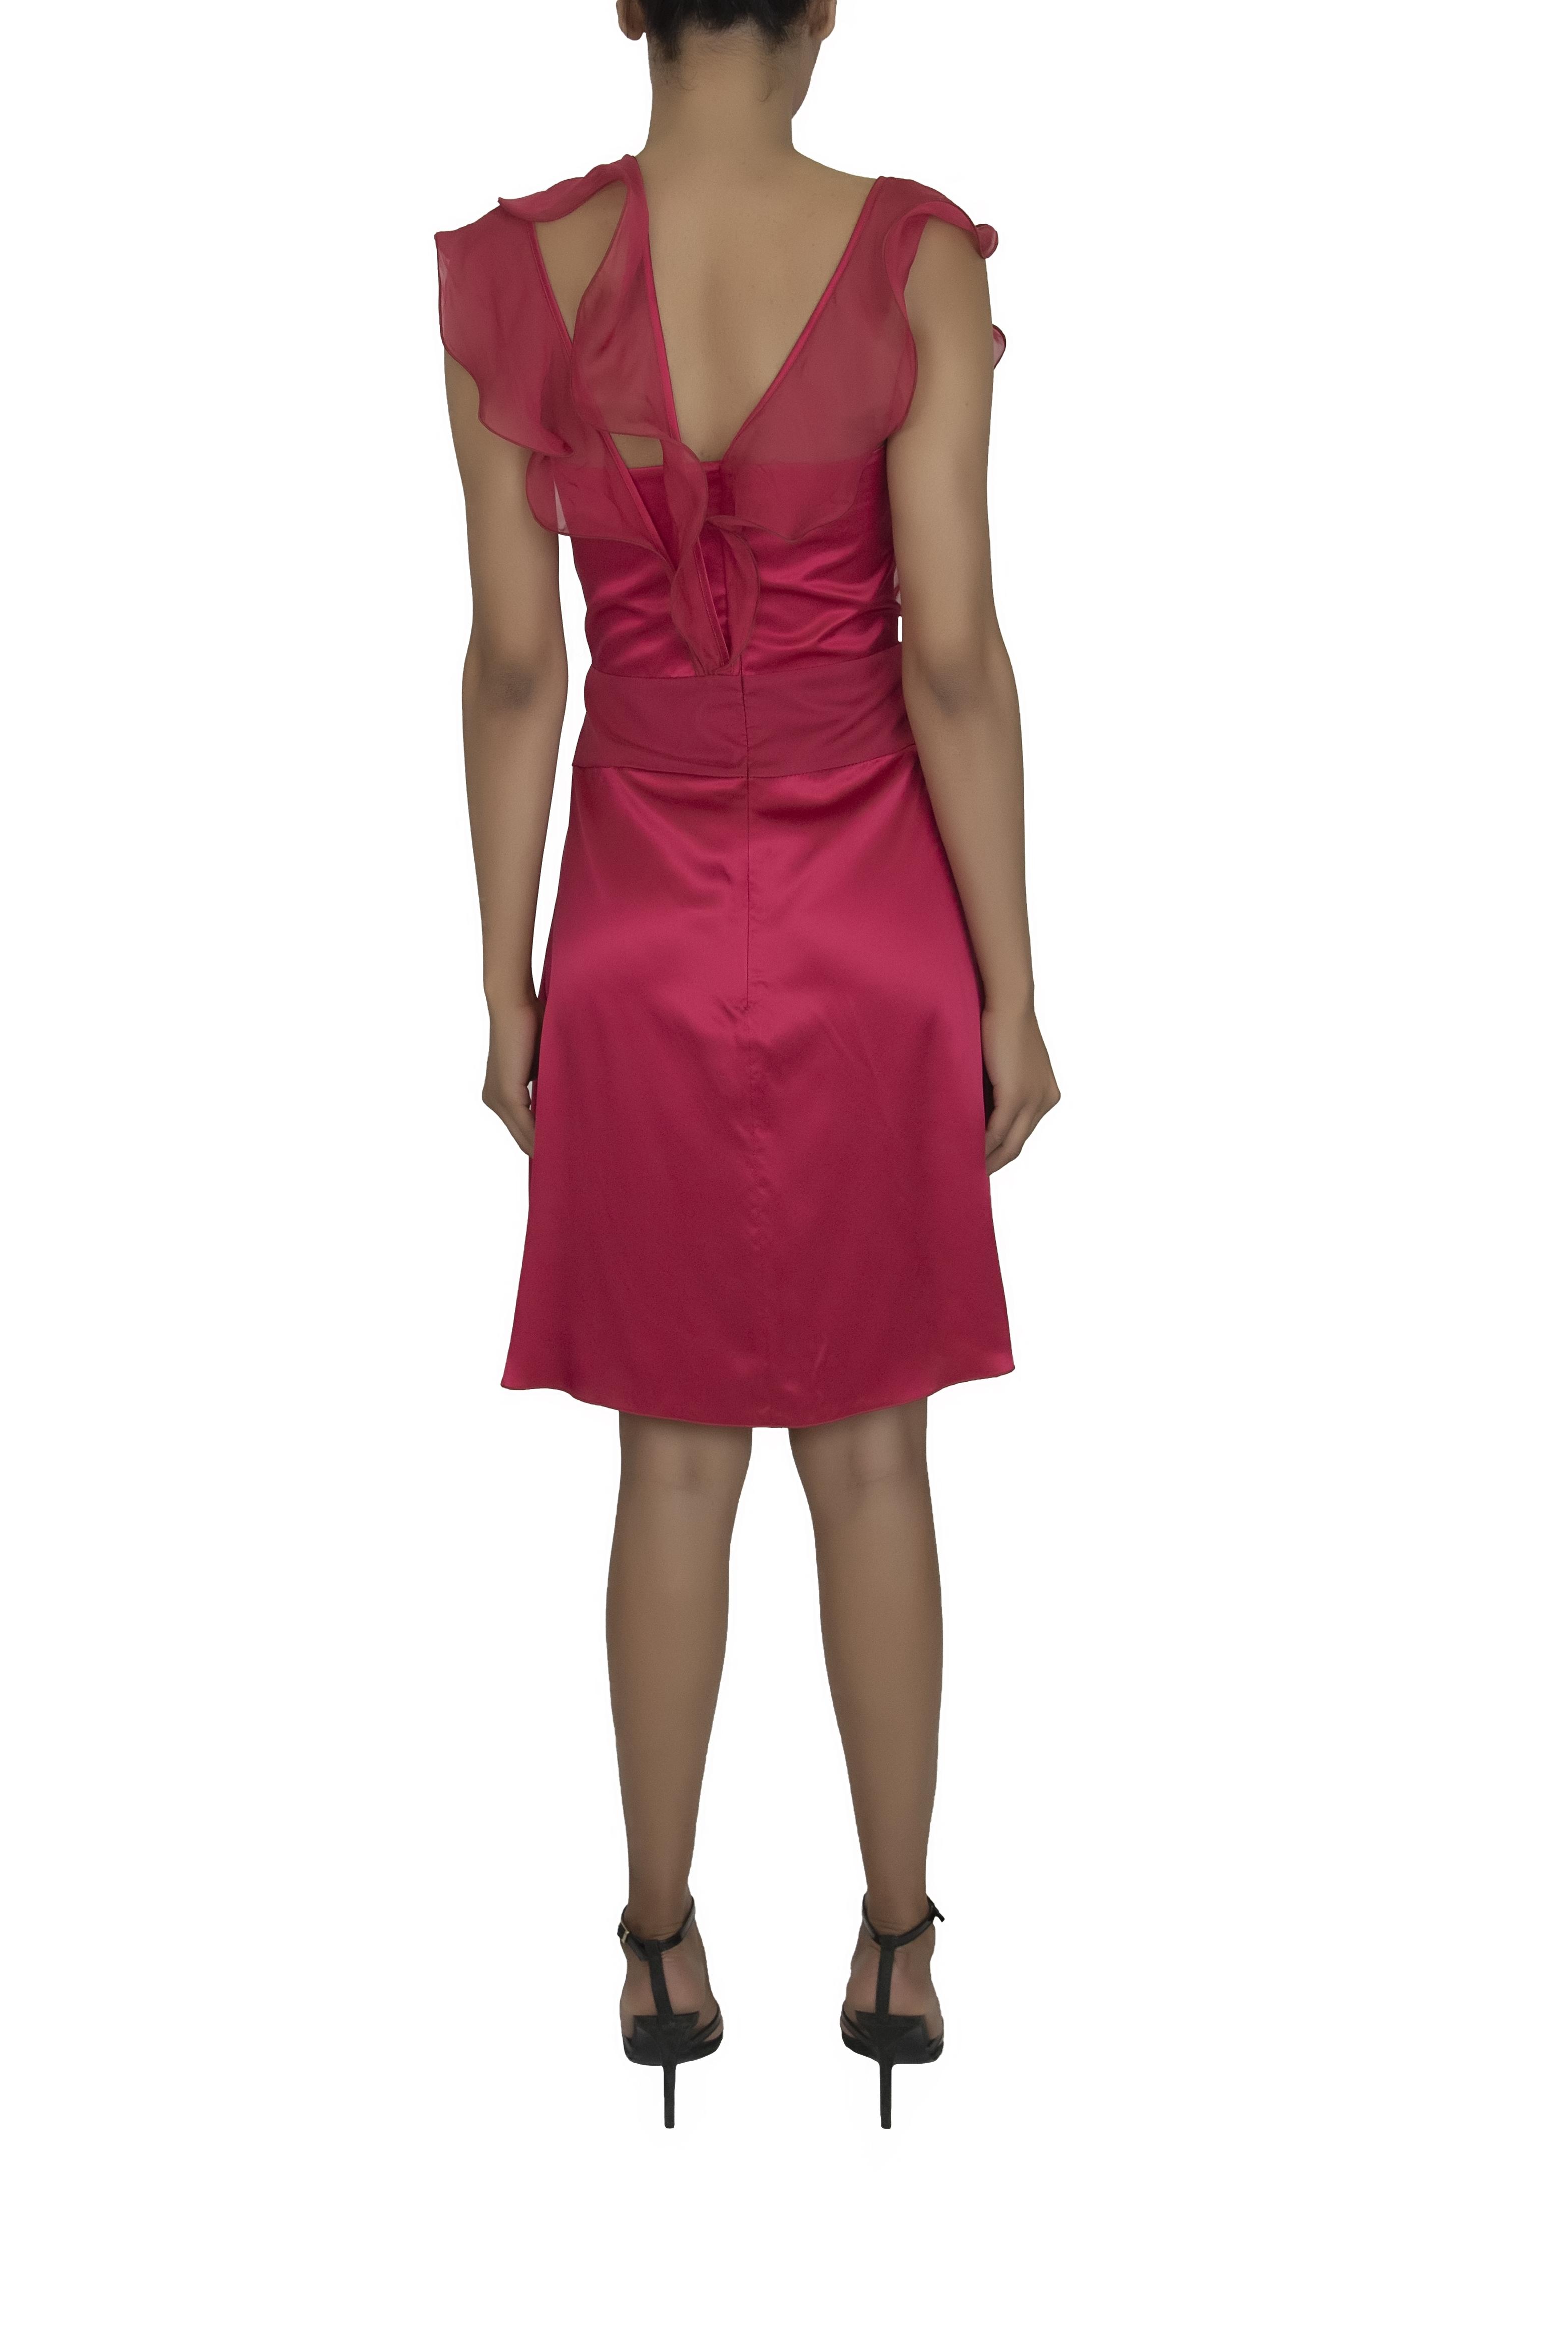 Dress DENEBOLA 2